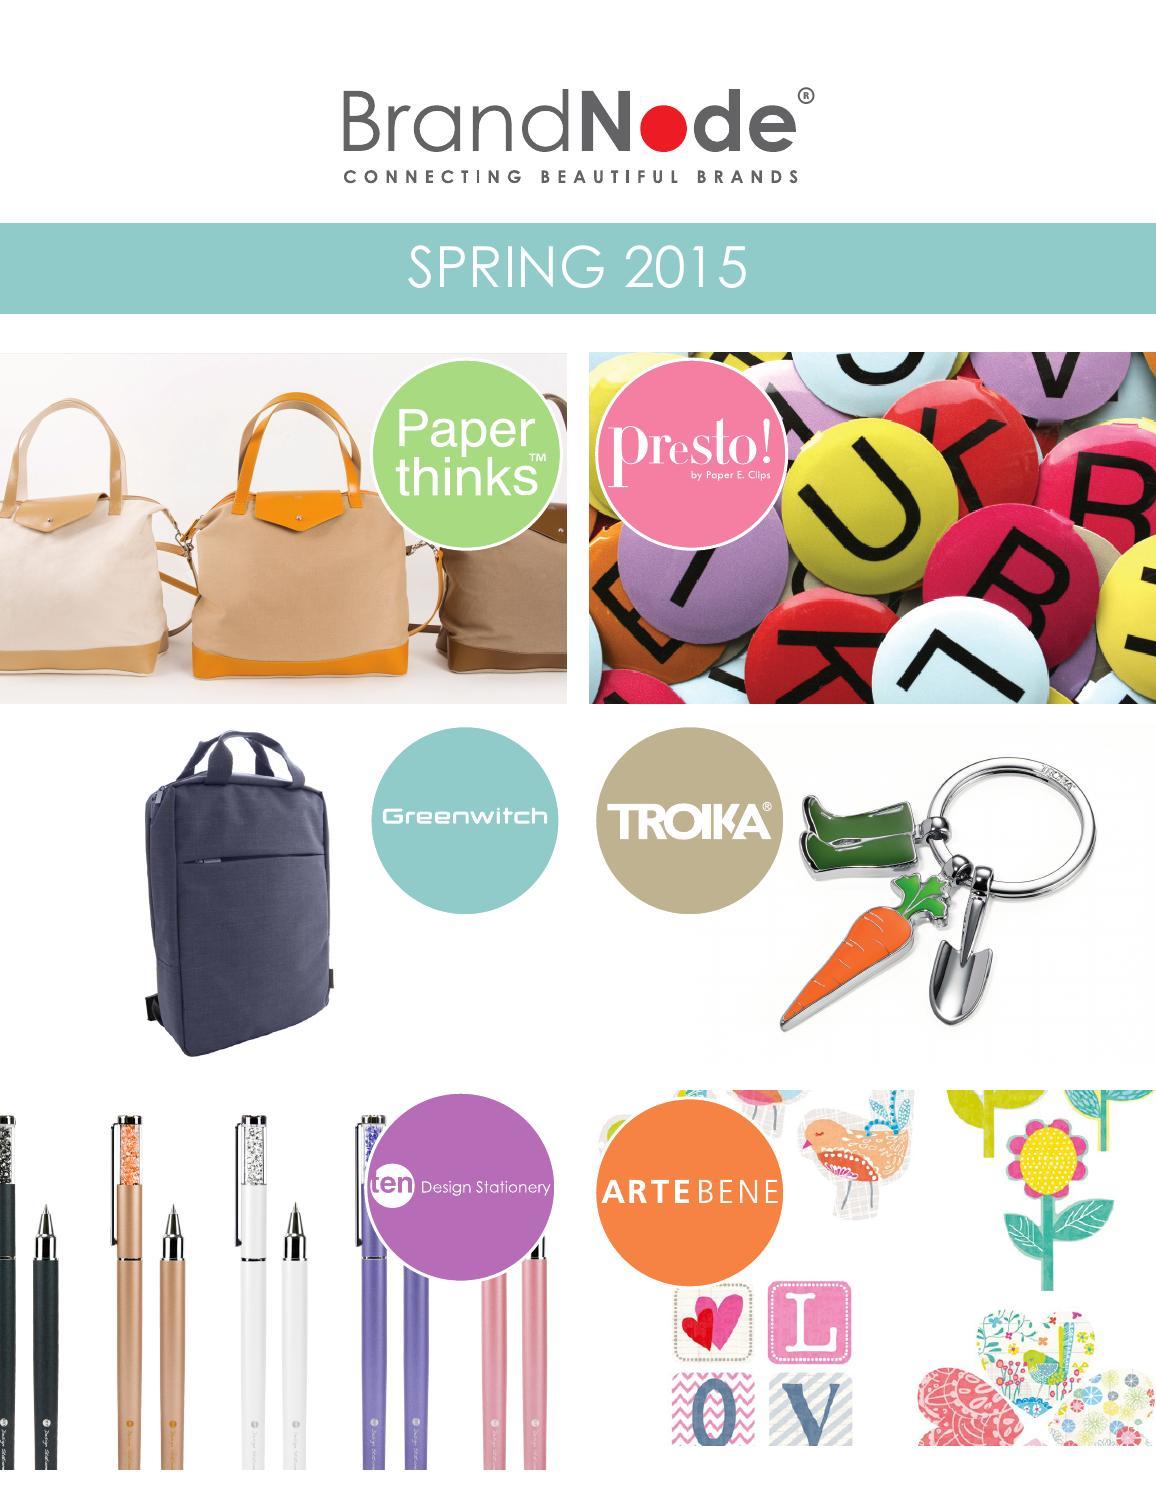 Brand Node Spring 2015 Catalog by Brand Node - issuu